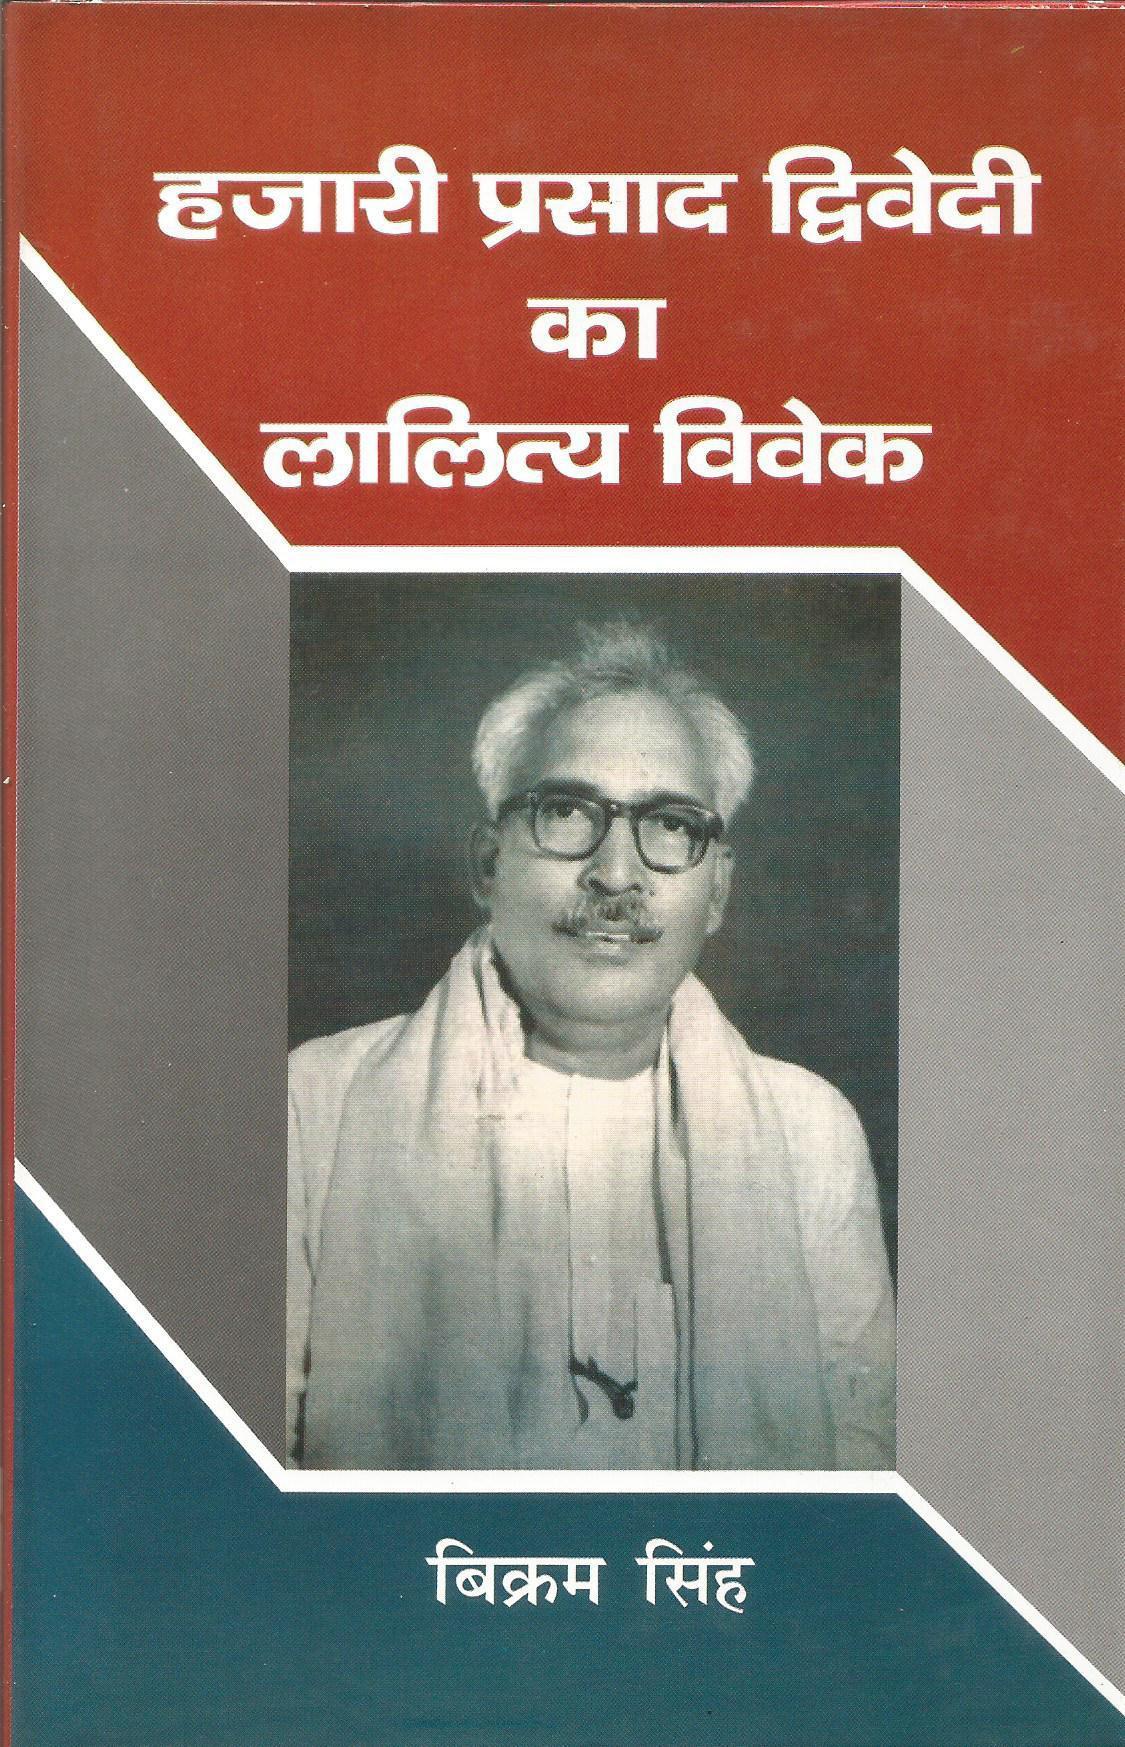 vichar pravah hazari prasad dwivedi Hindi dec 10, 2015 documents tarun-dutt-devrani of 138.